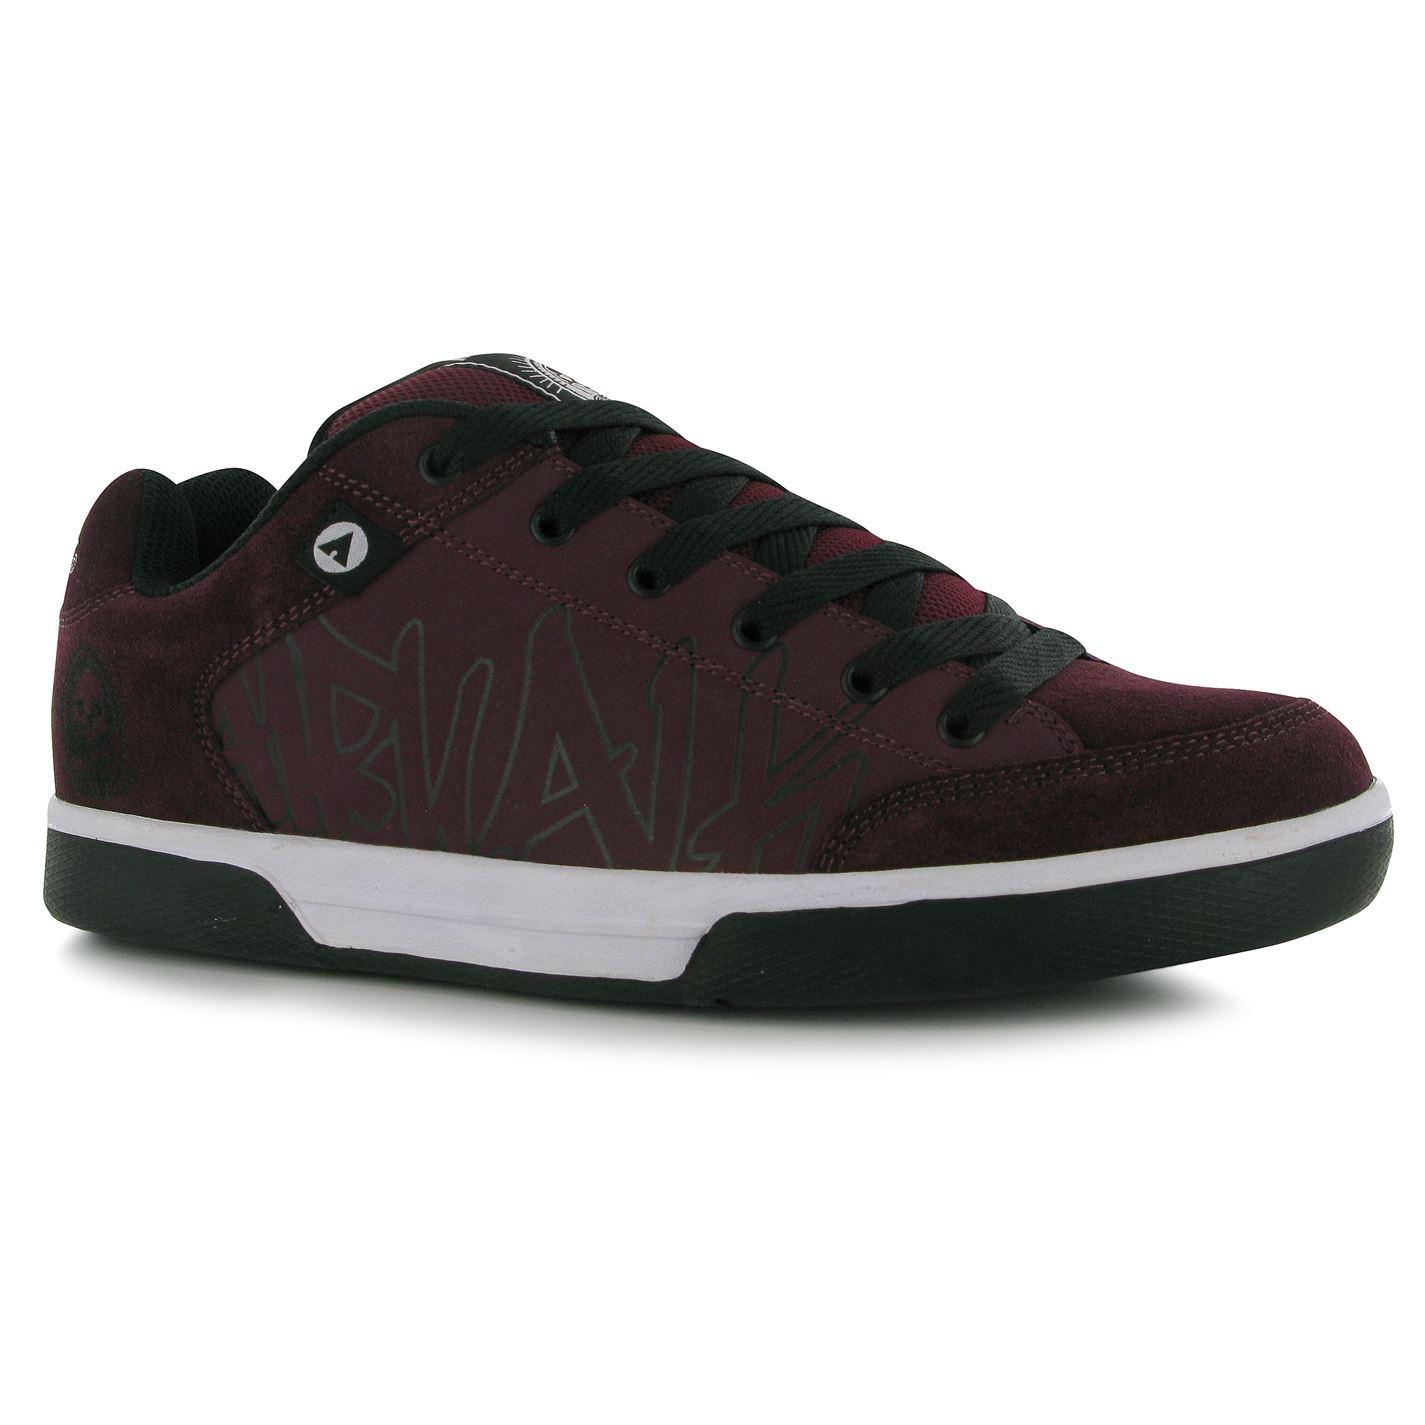 Airwalk Outlaw Skate Shoes Mens